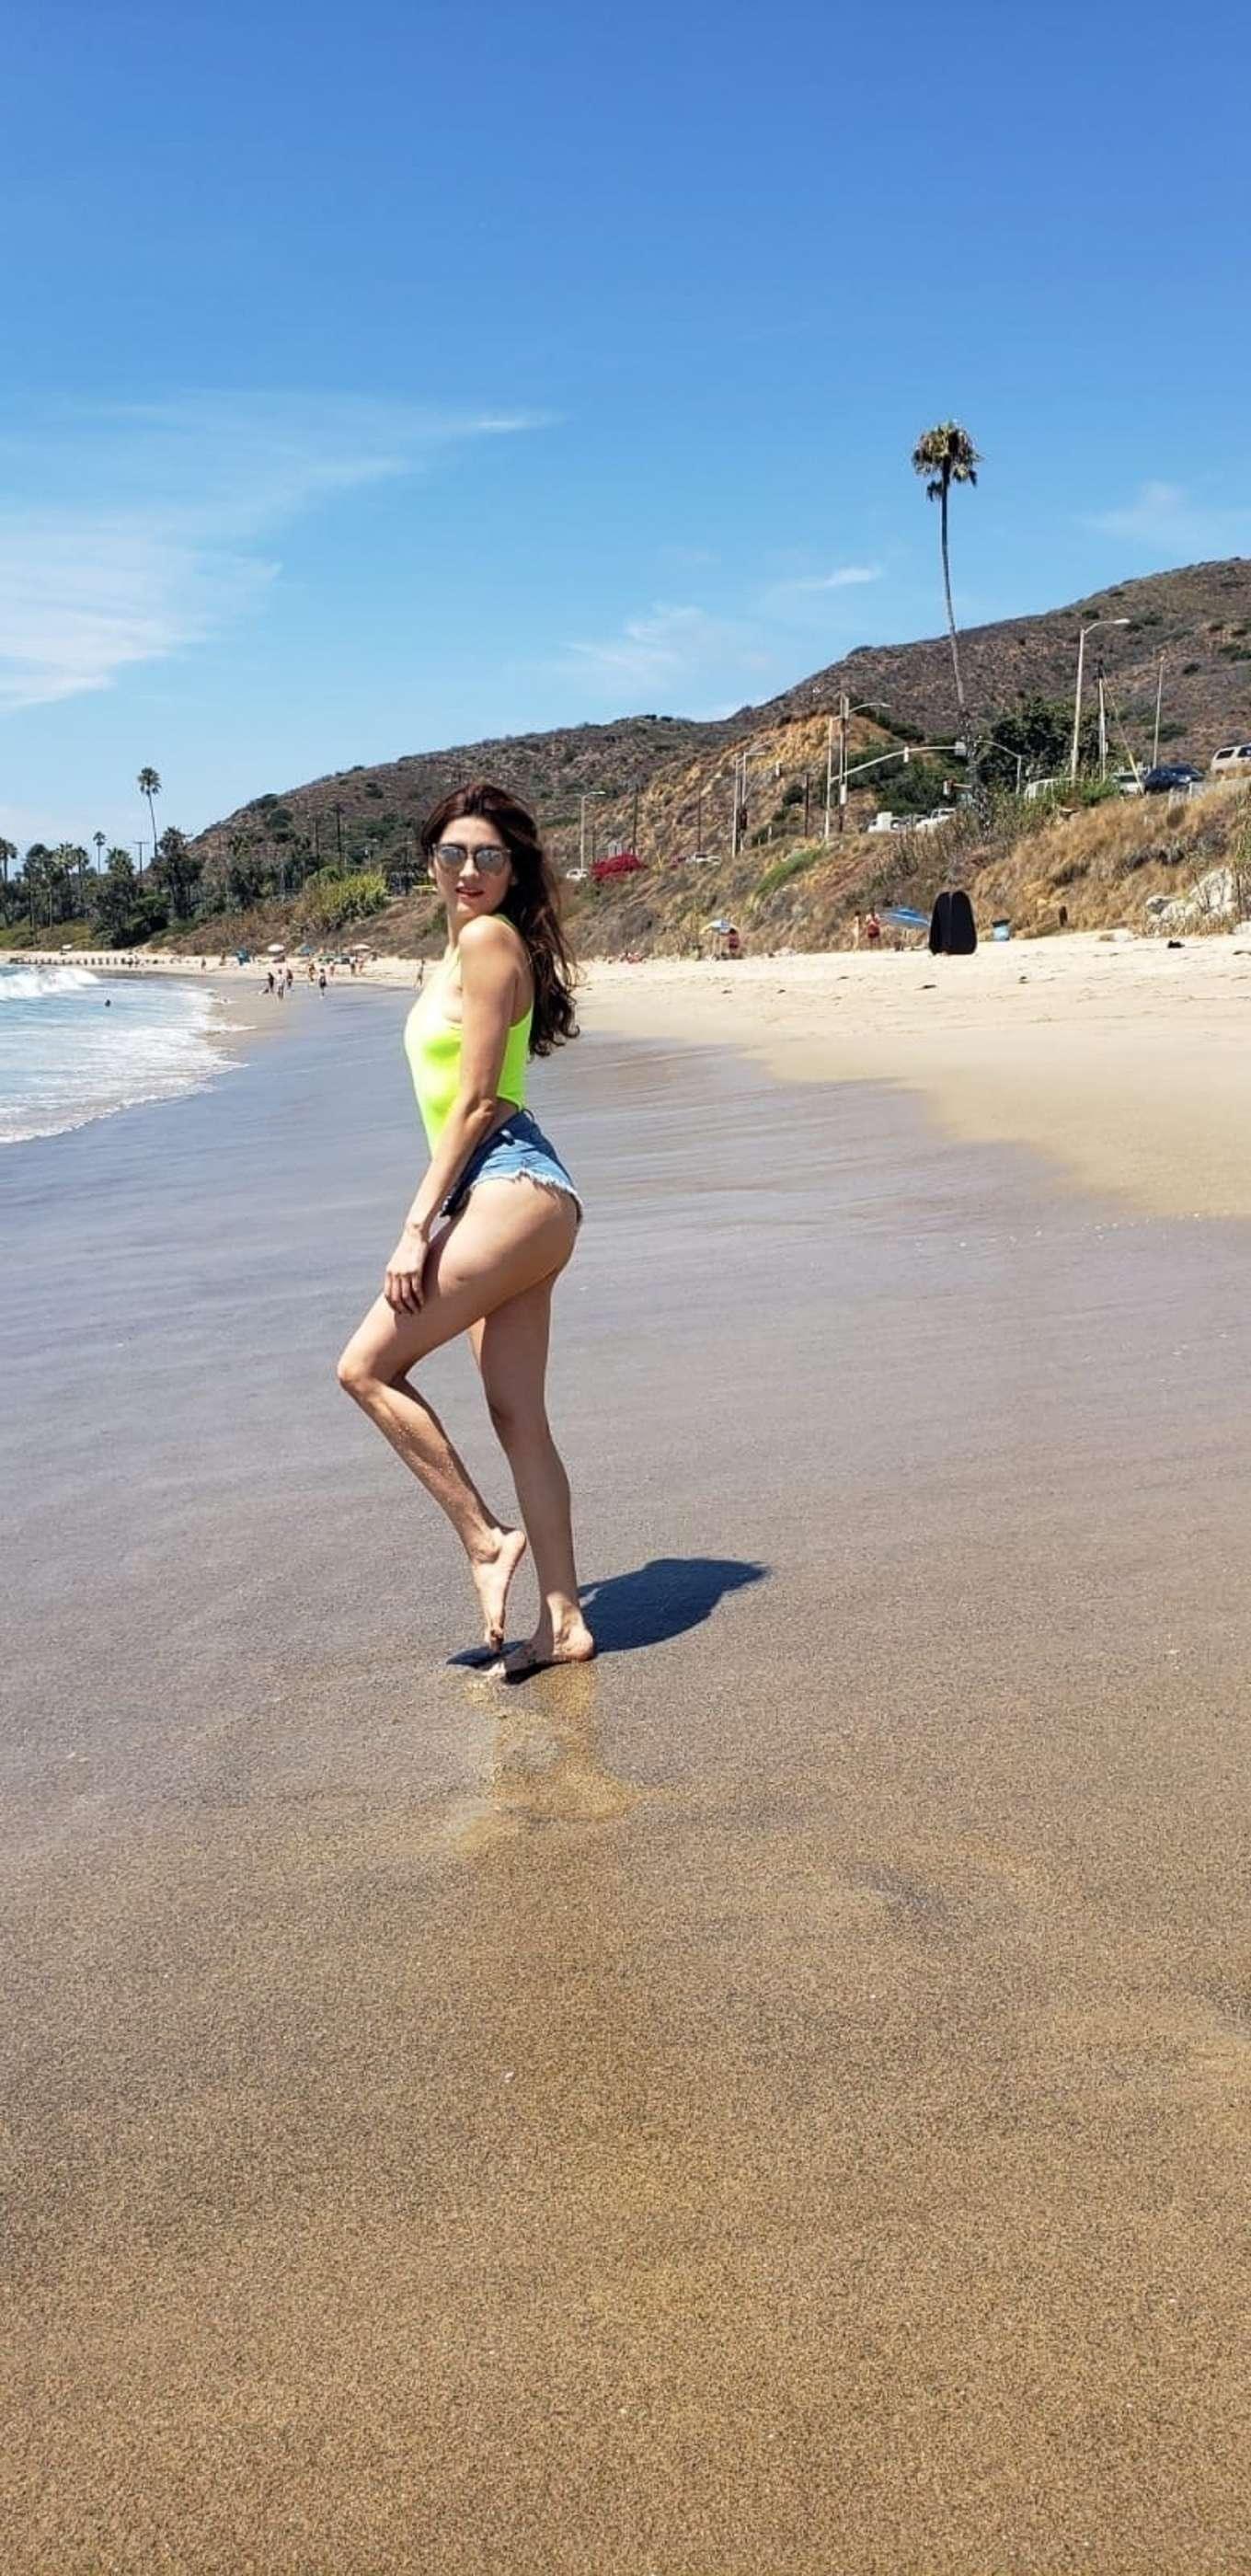 Blanca Blanco - On the beach in Malibu CA